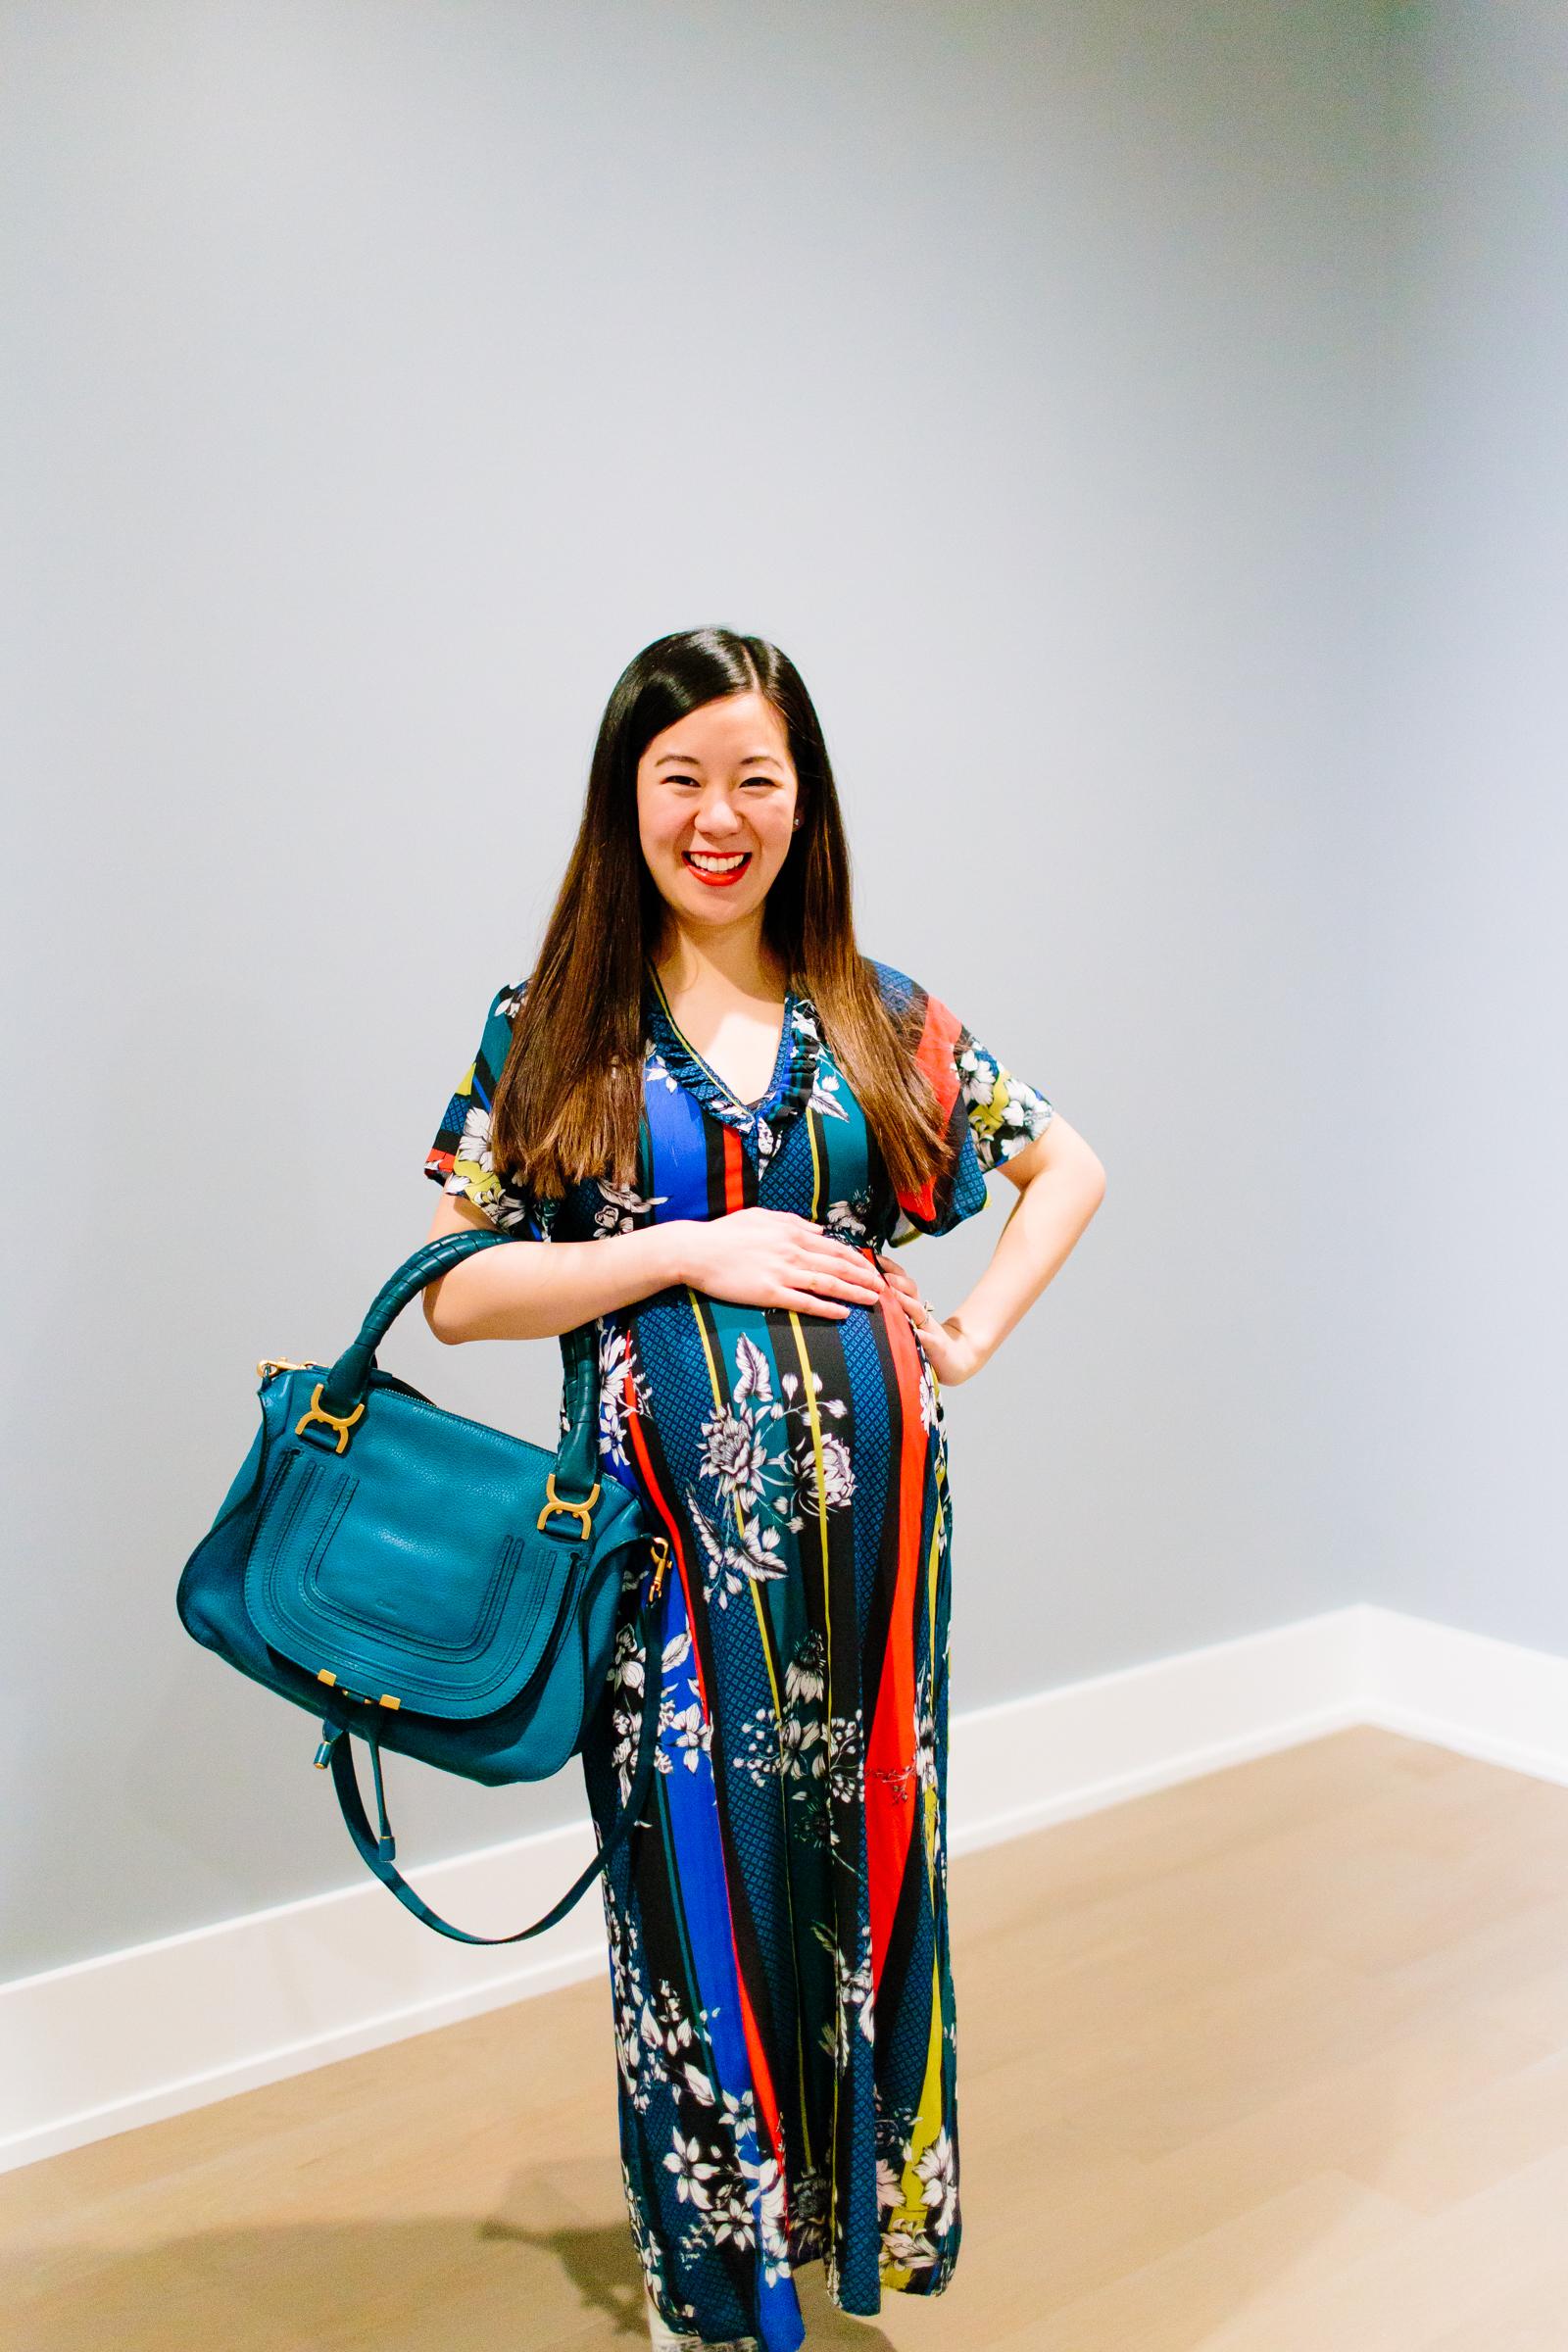 658fde4297 Colorful Maternity Dress for Multiple Occasions - Tia Perciballi